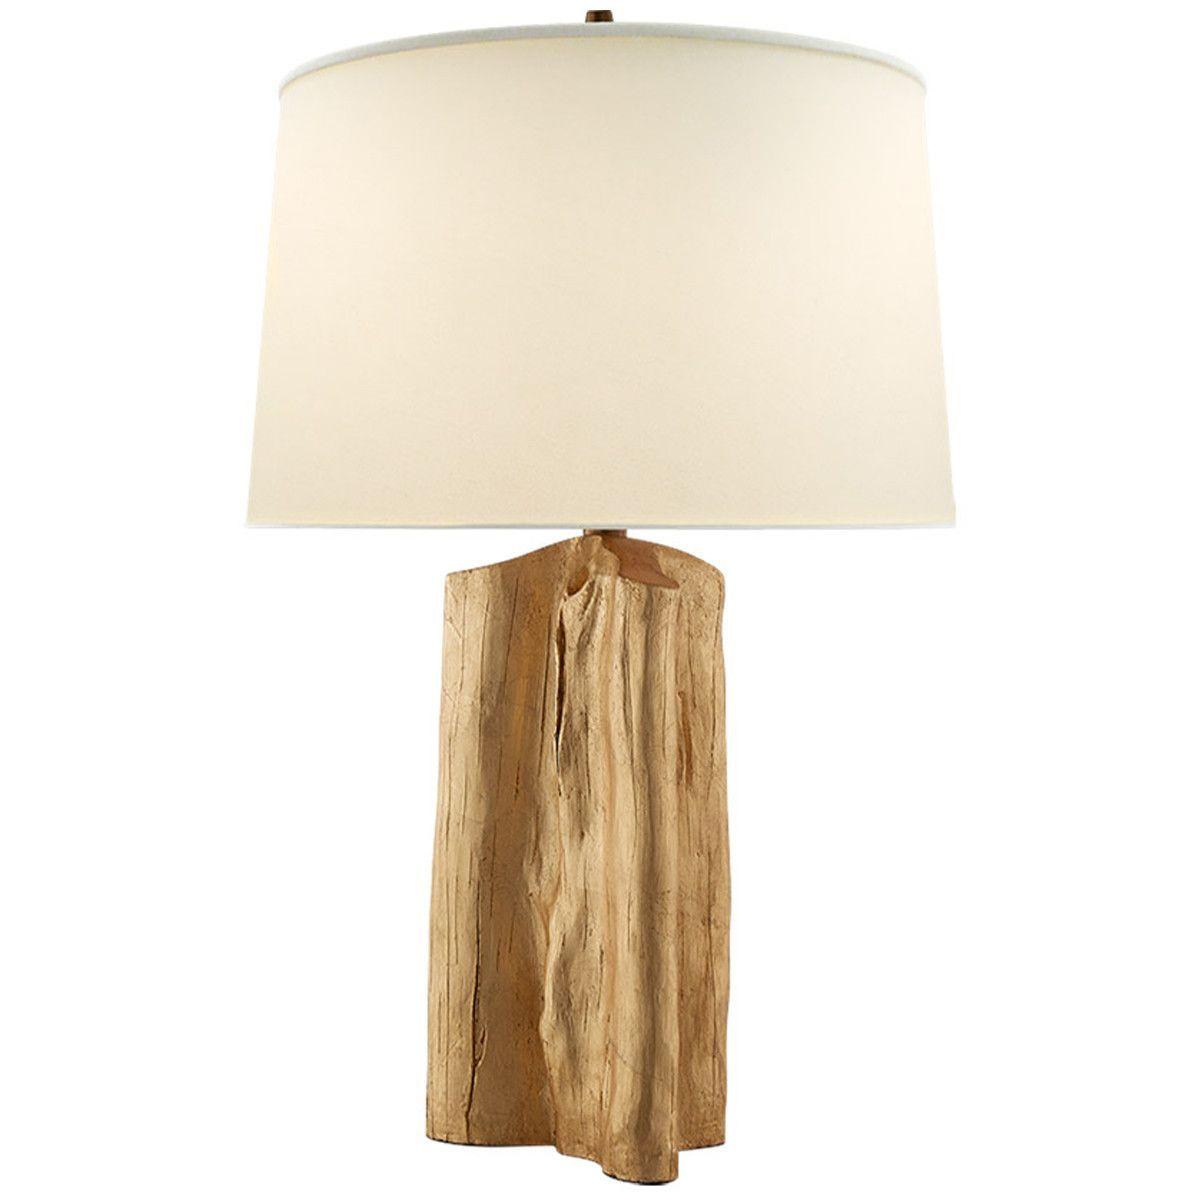 Visual Comfort Lighting Thomas OBrien Sierra 1 Light Table Lamp